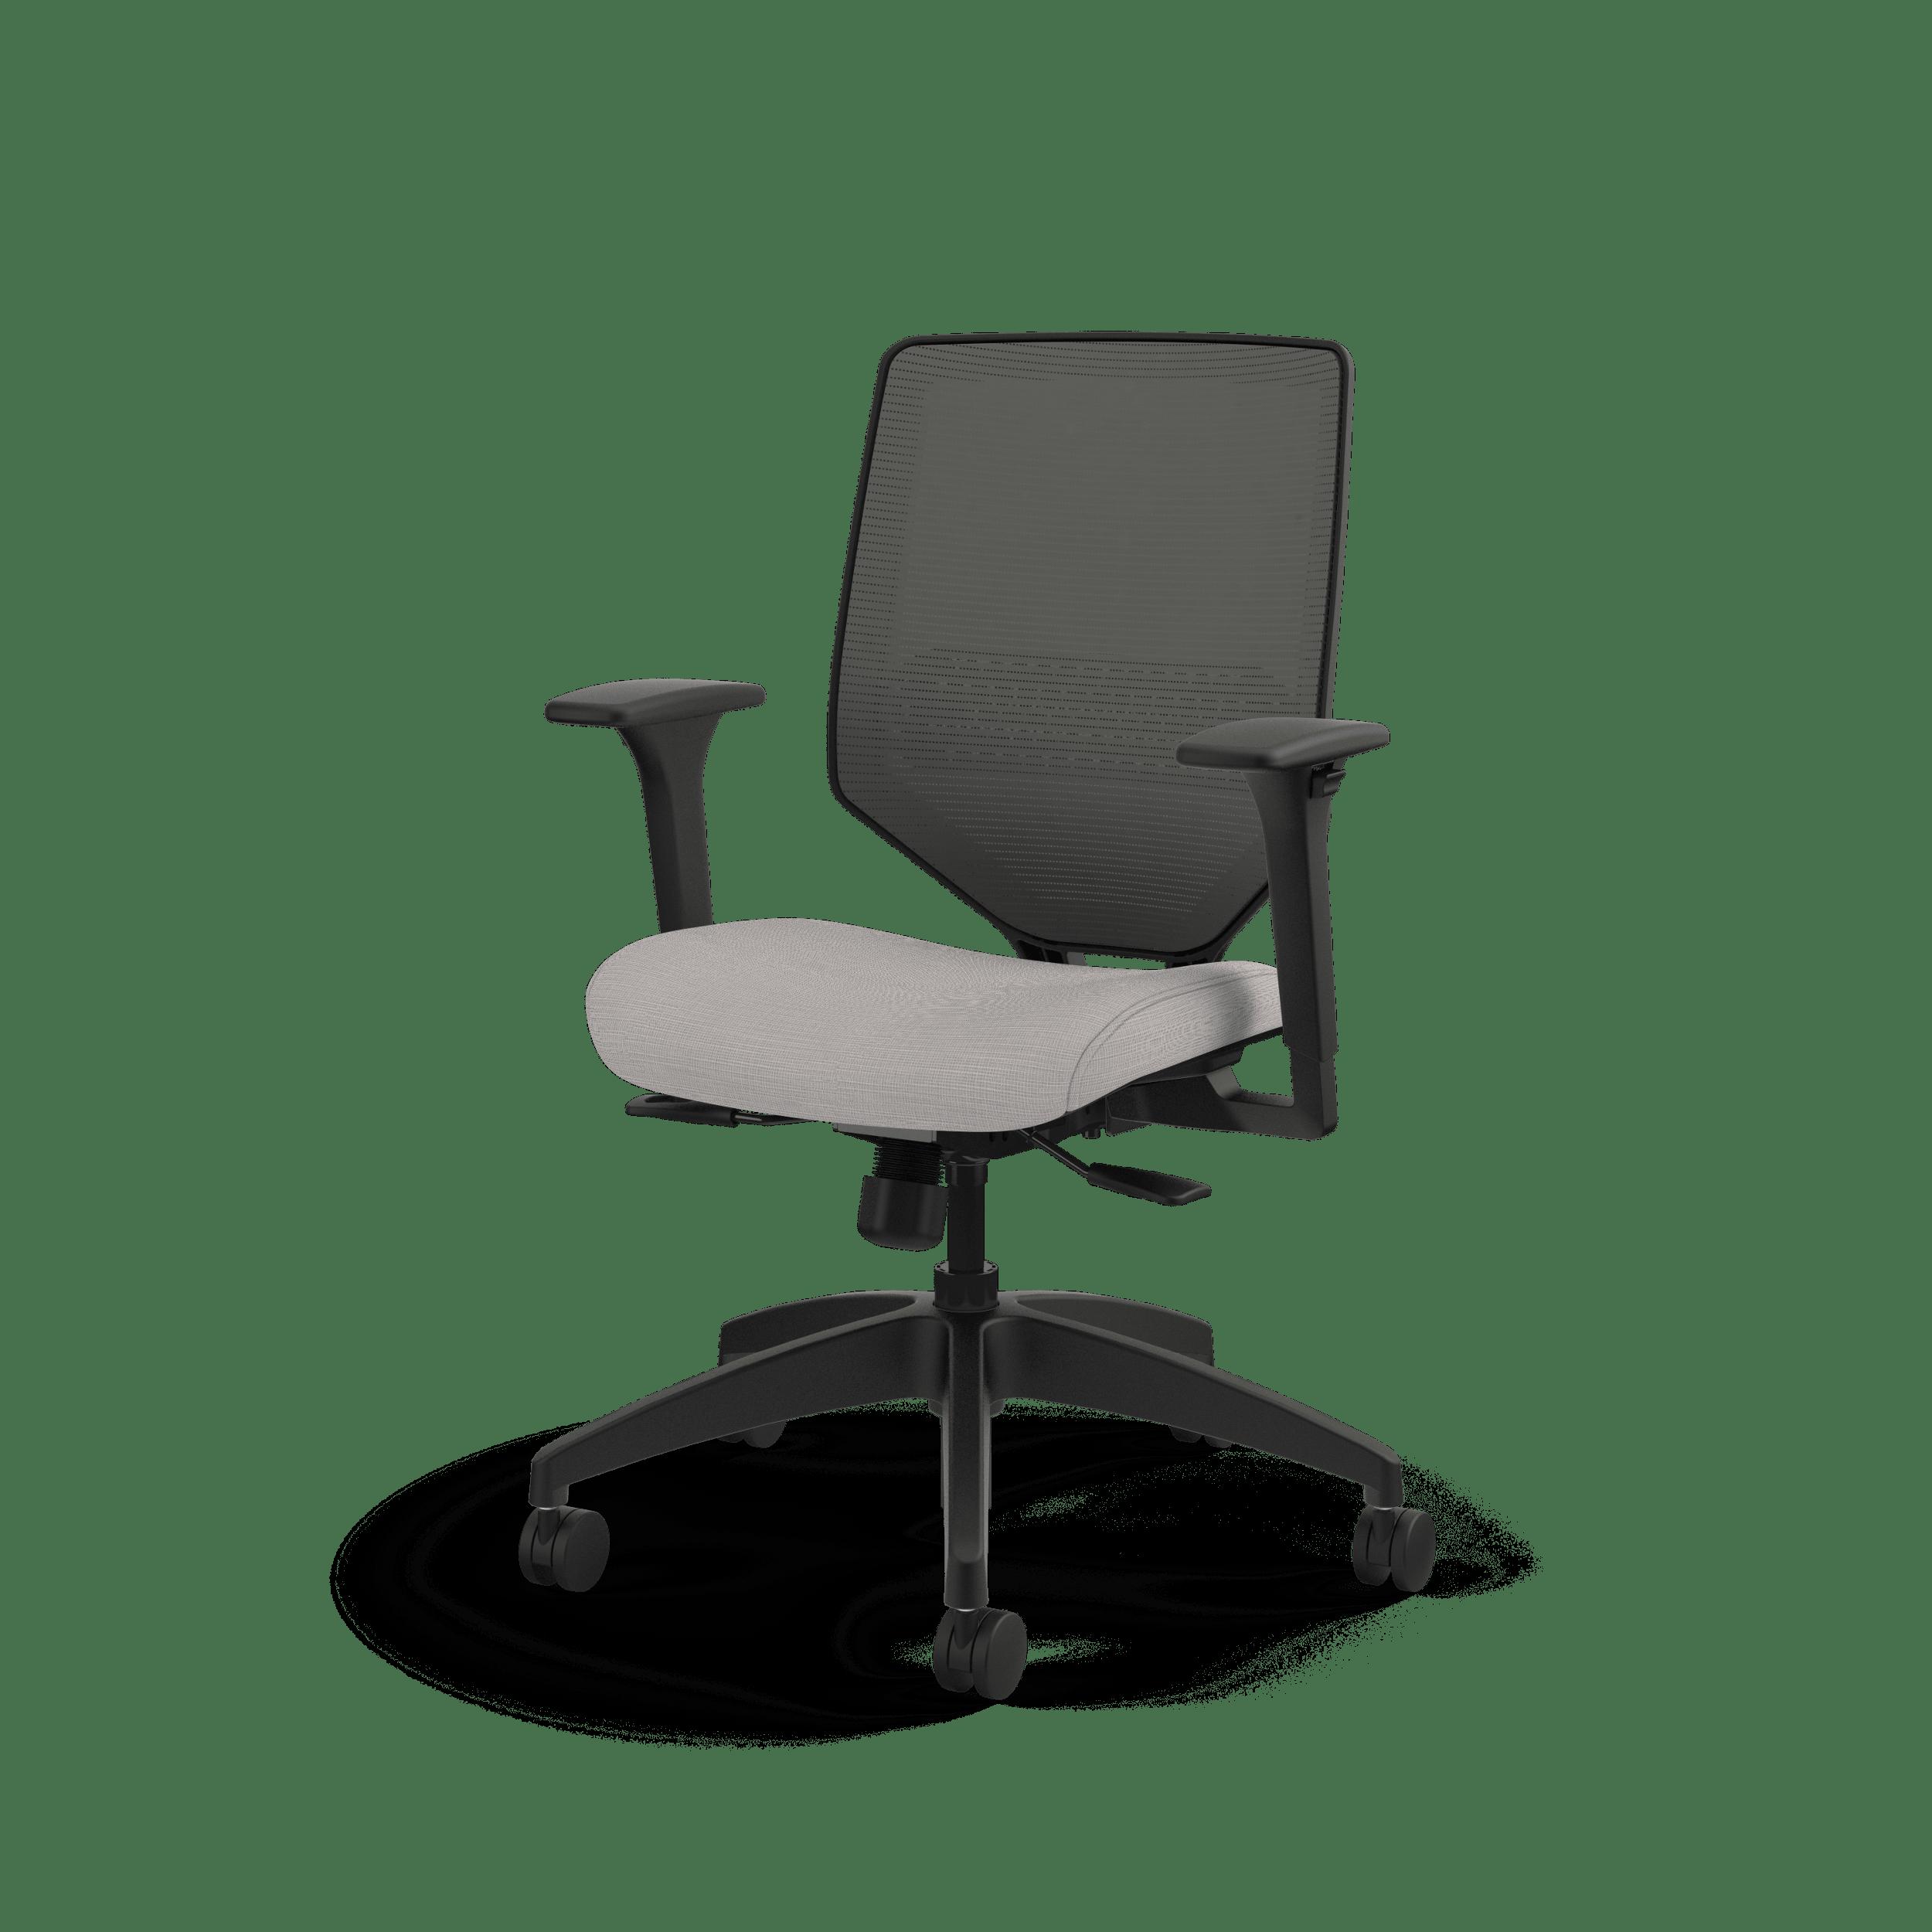 Seating Ergonomics 101 Hon Office Furniture